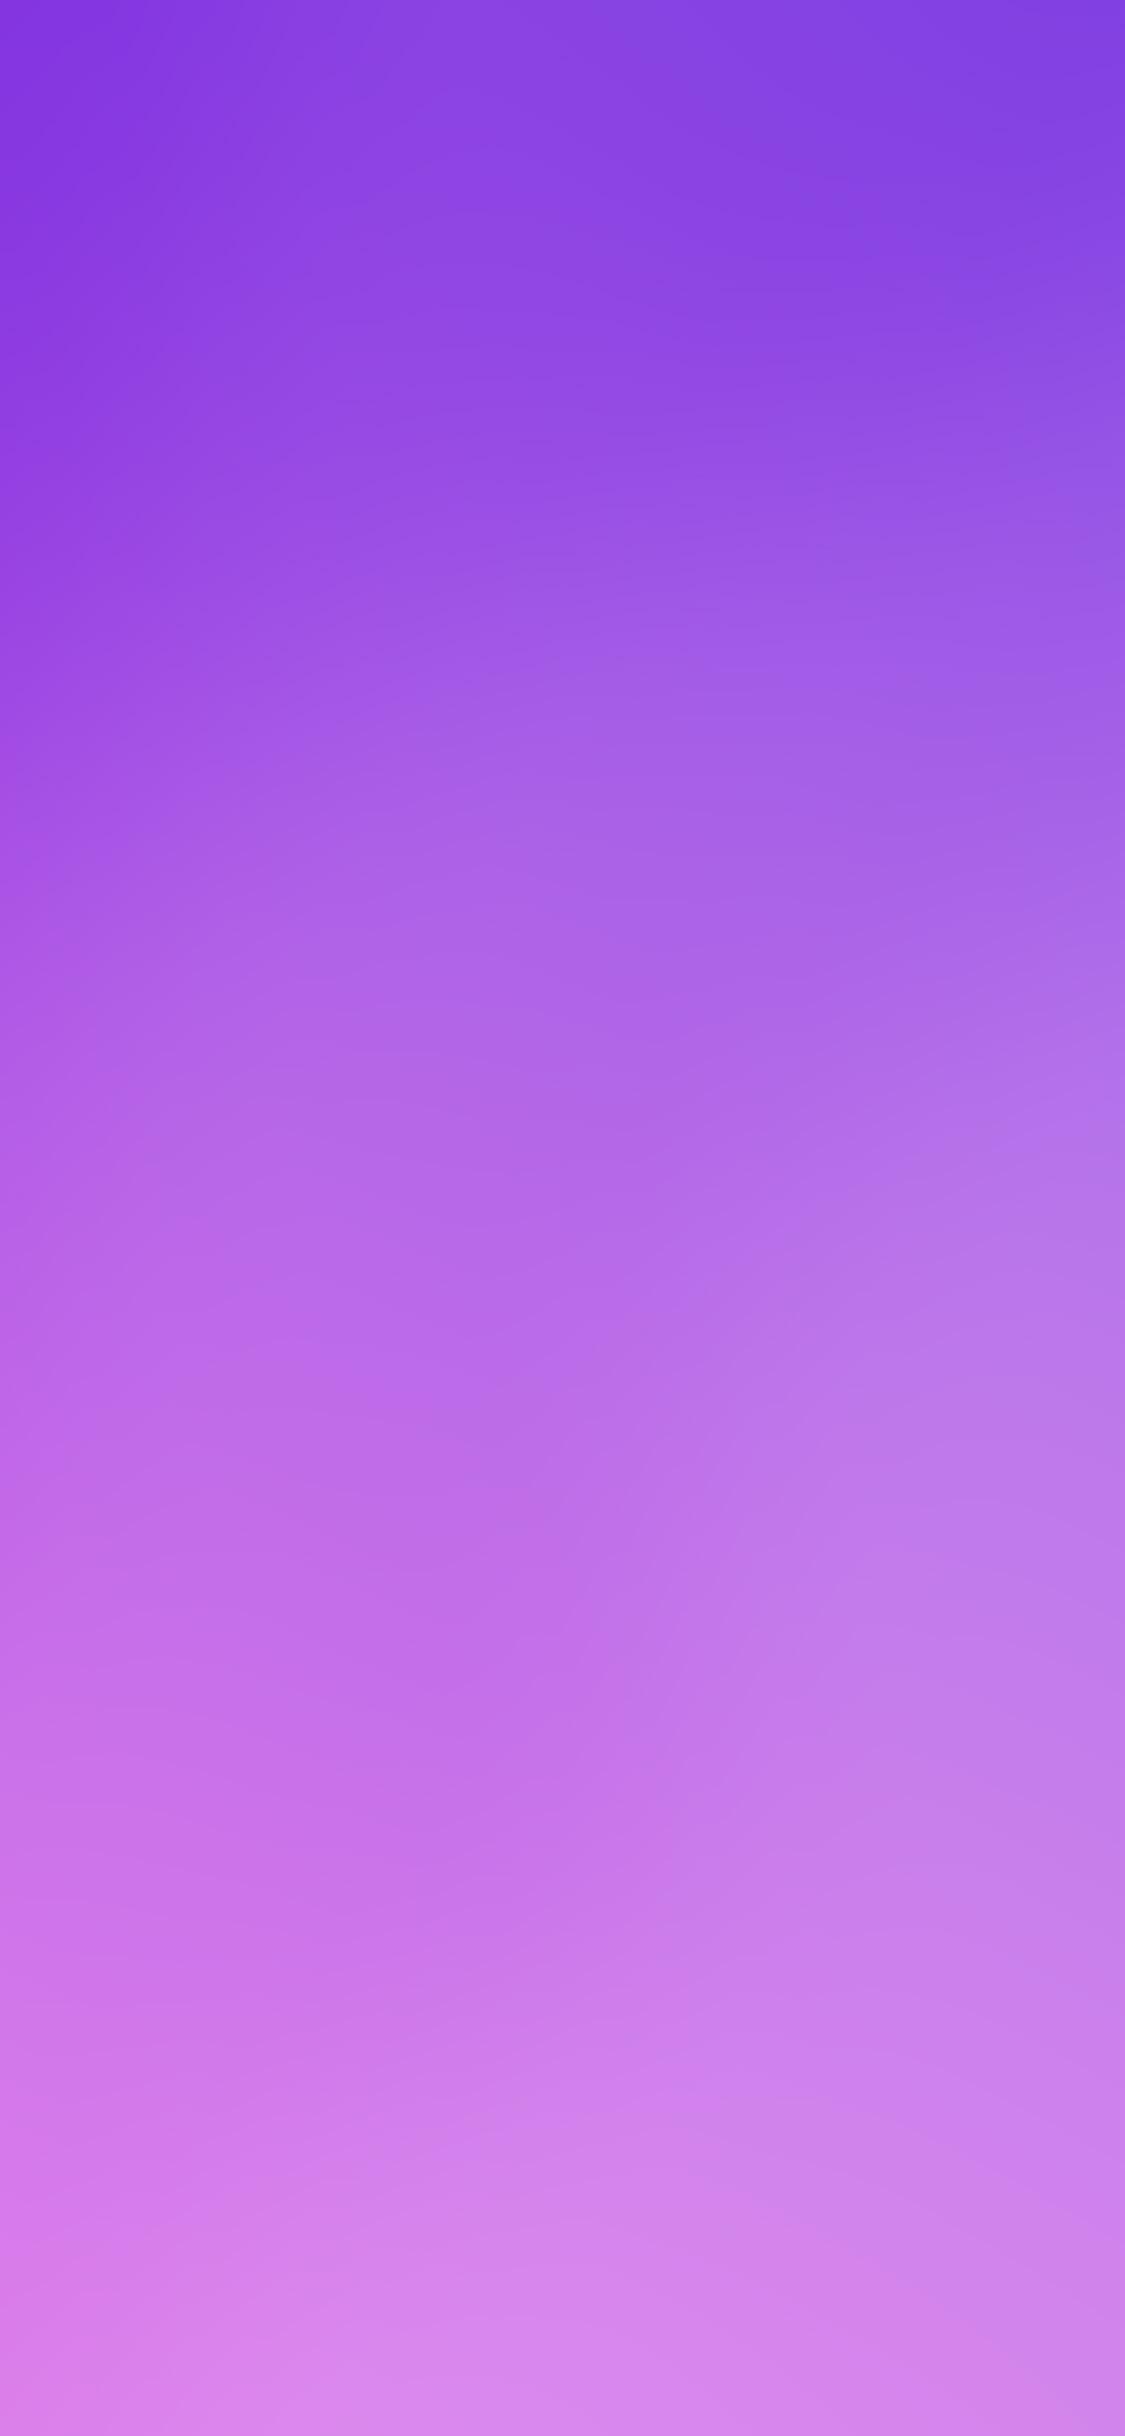 iPhonexpapers.com-Apple-iPhone-wallpaper-sm01-purple-soft-blur-gradation